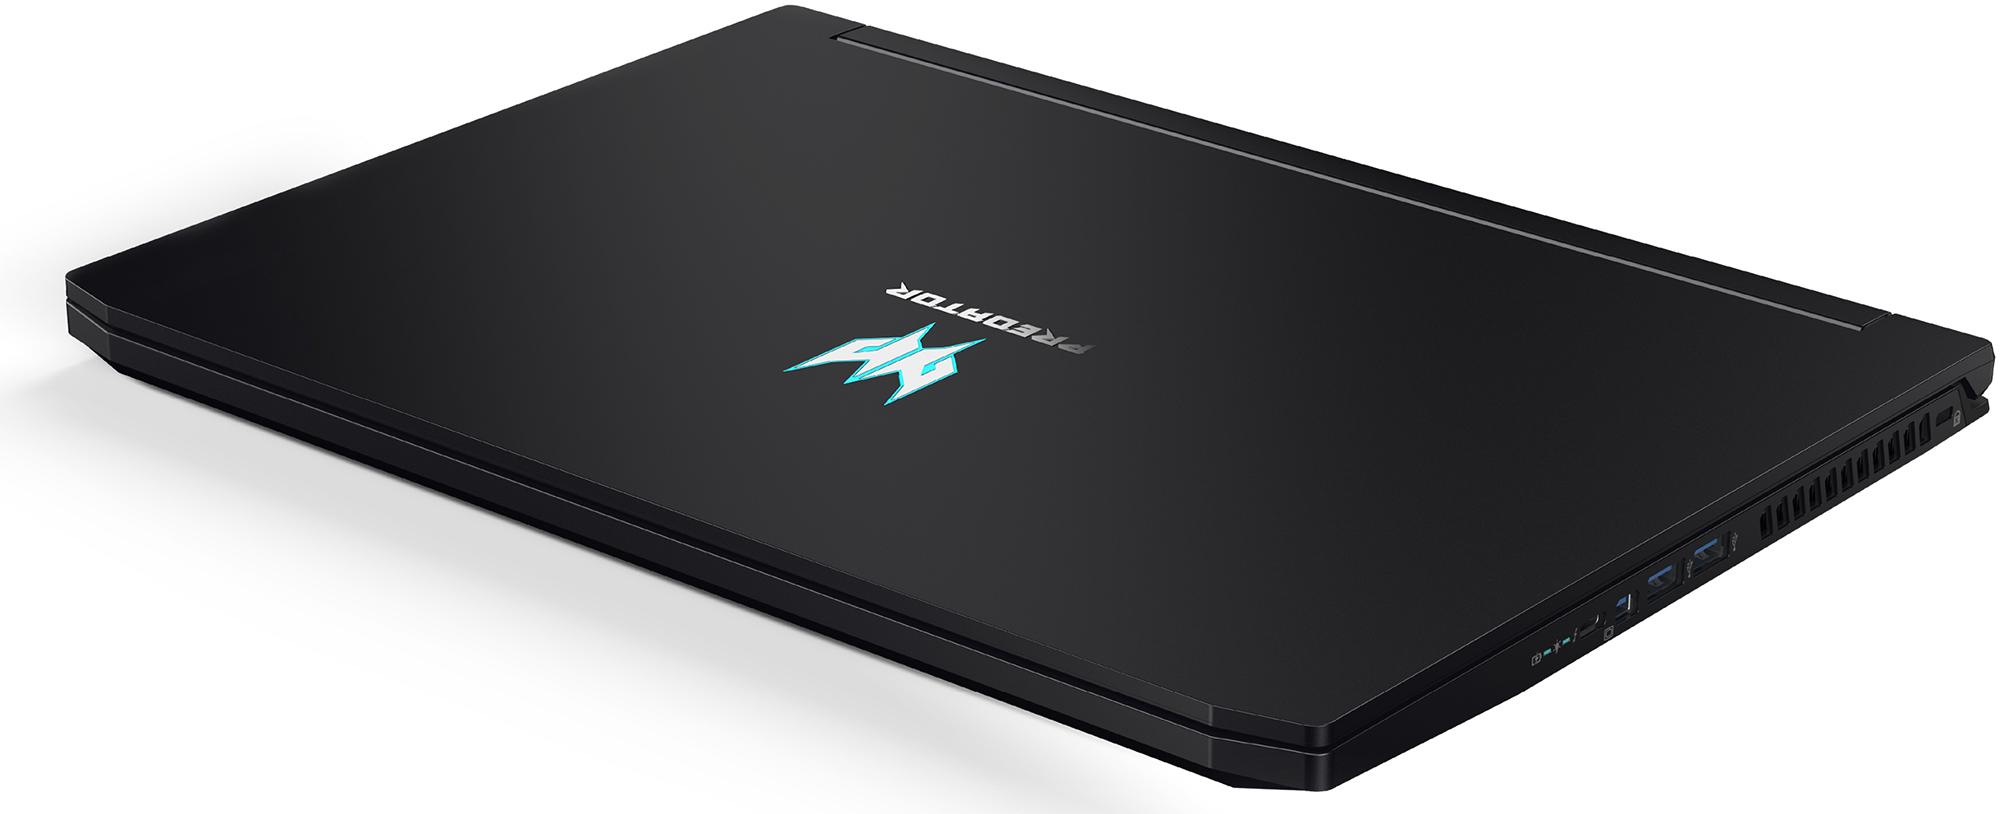 Blink Quickly: Acer's Predator Triton 500 Gets a 300 Hz Display